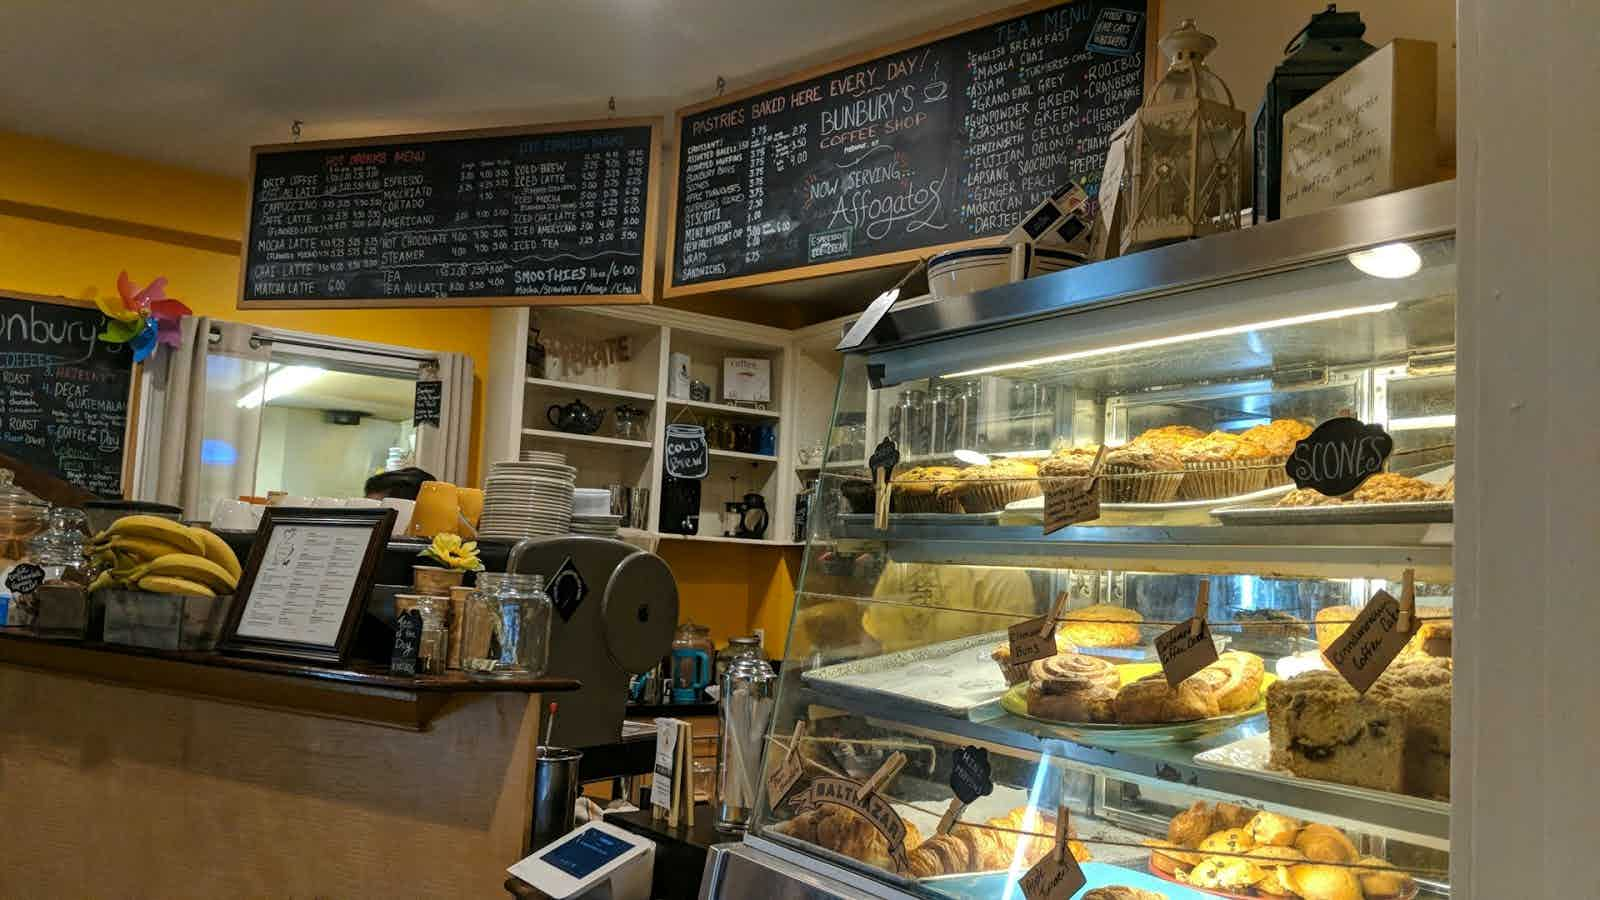 Bunbury's Coffee Shop - Piermont | Restaurant Review - Zagat